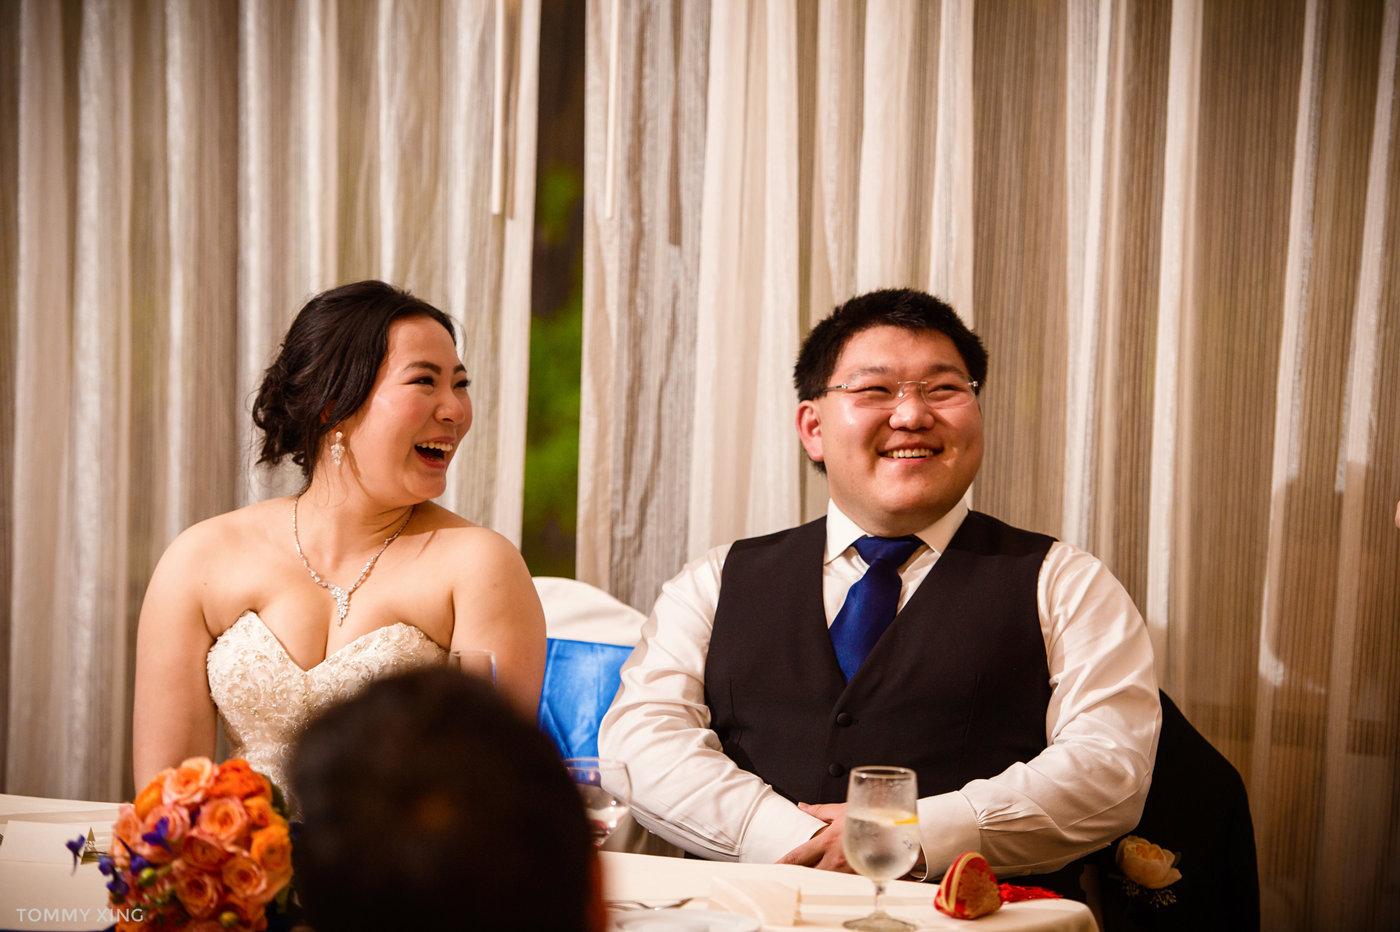 STANFORD MEMORIAL CHURCH WEDDING - Wenjie & Chengcheng - SAN FRANCISCO BAY AREA 斯坦福教堂婚礼跟拍 - 洛杉矶婚礼婚纱照摄影师 Tommy Xing Photography186.jpg